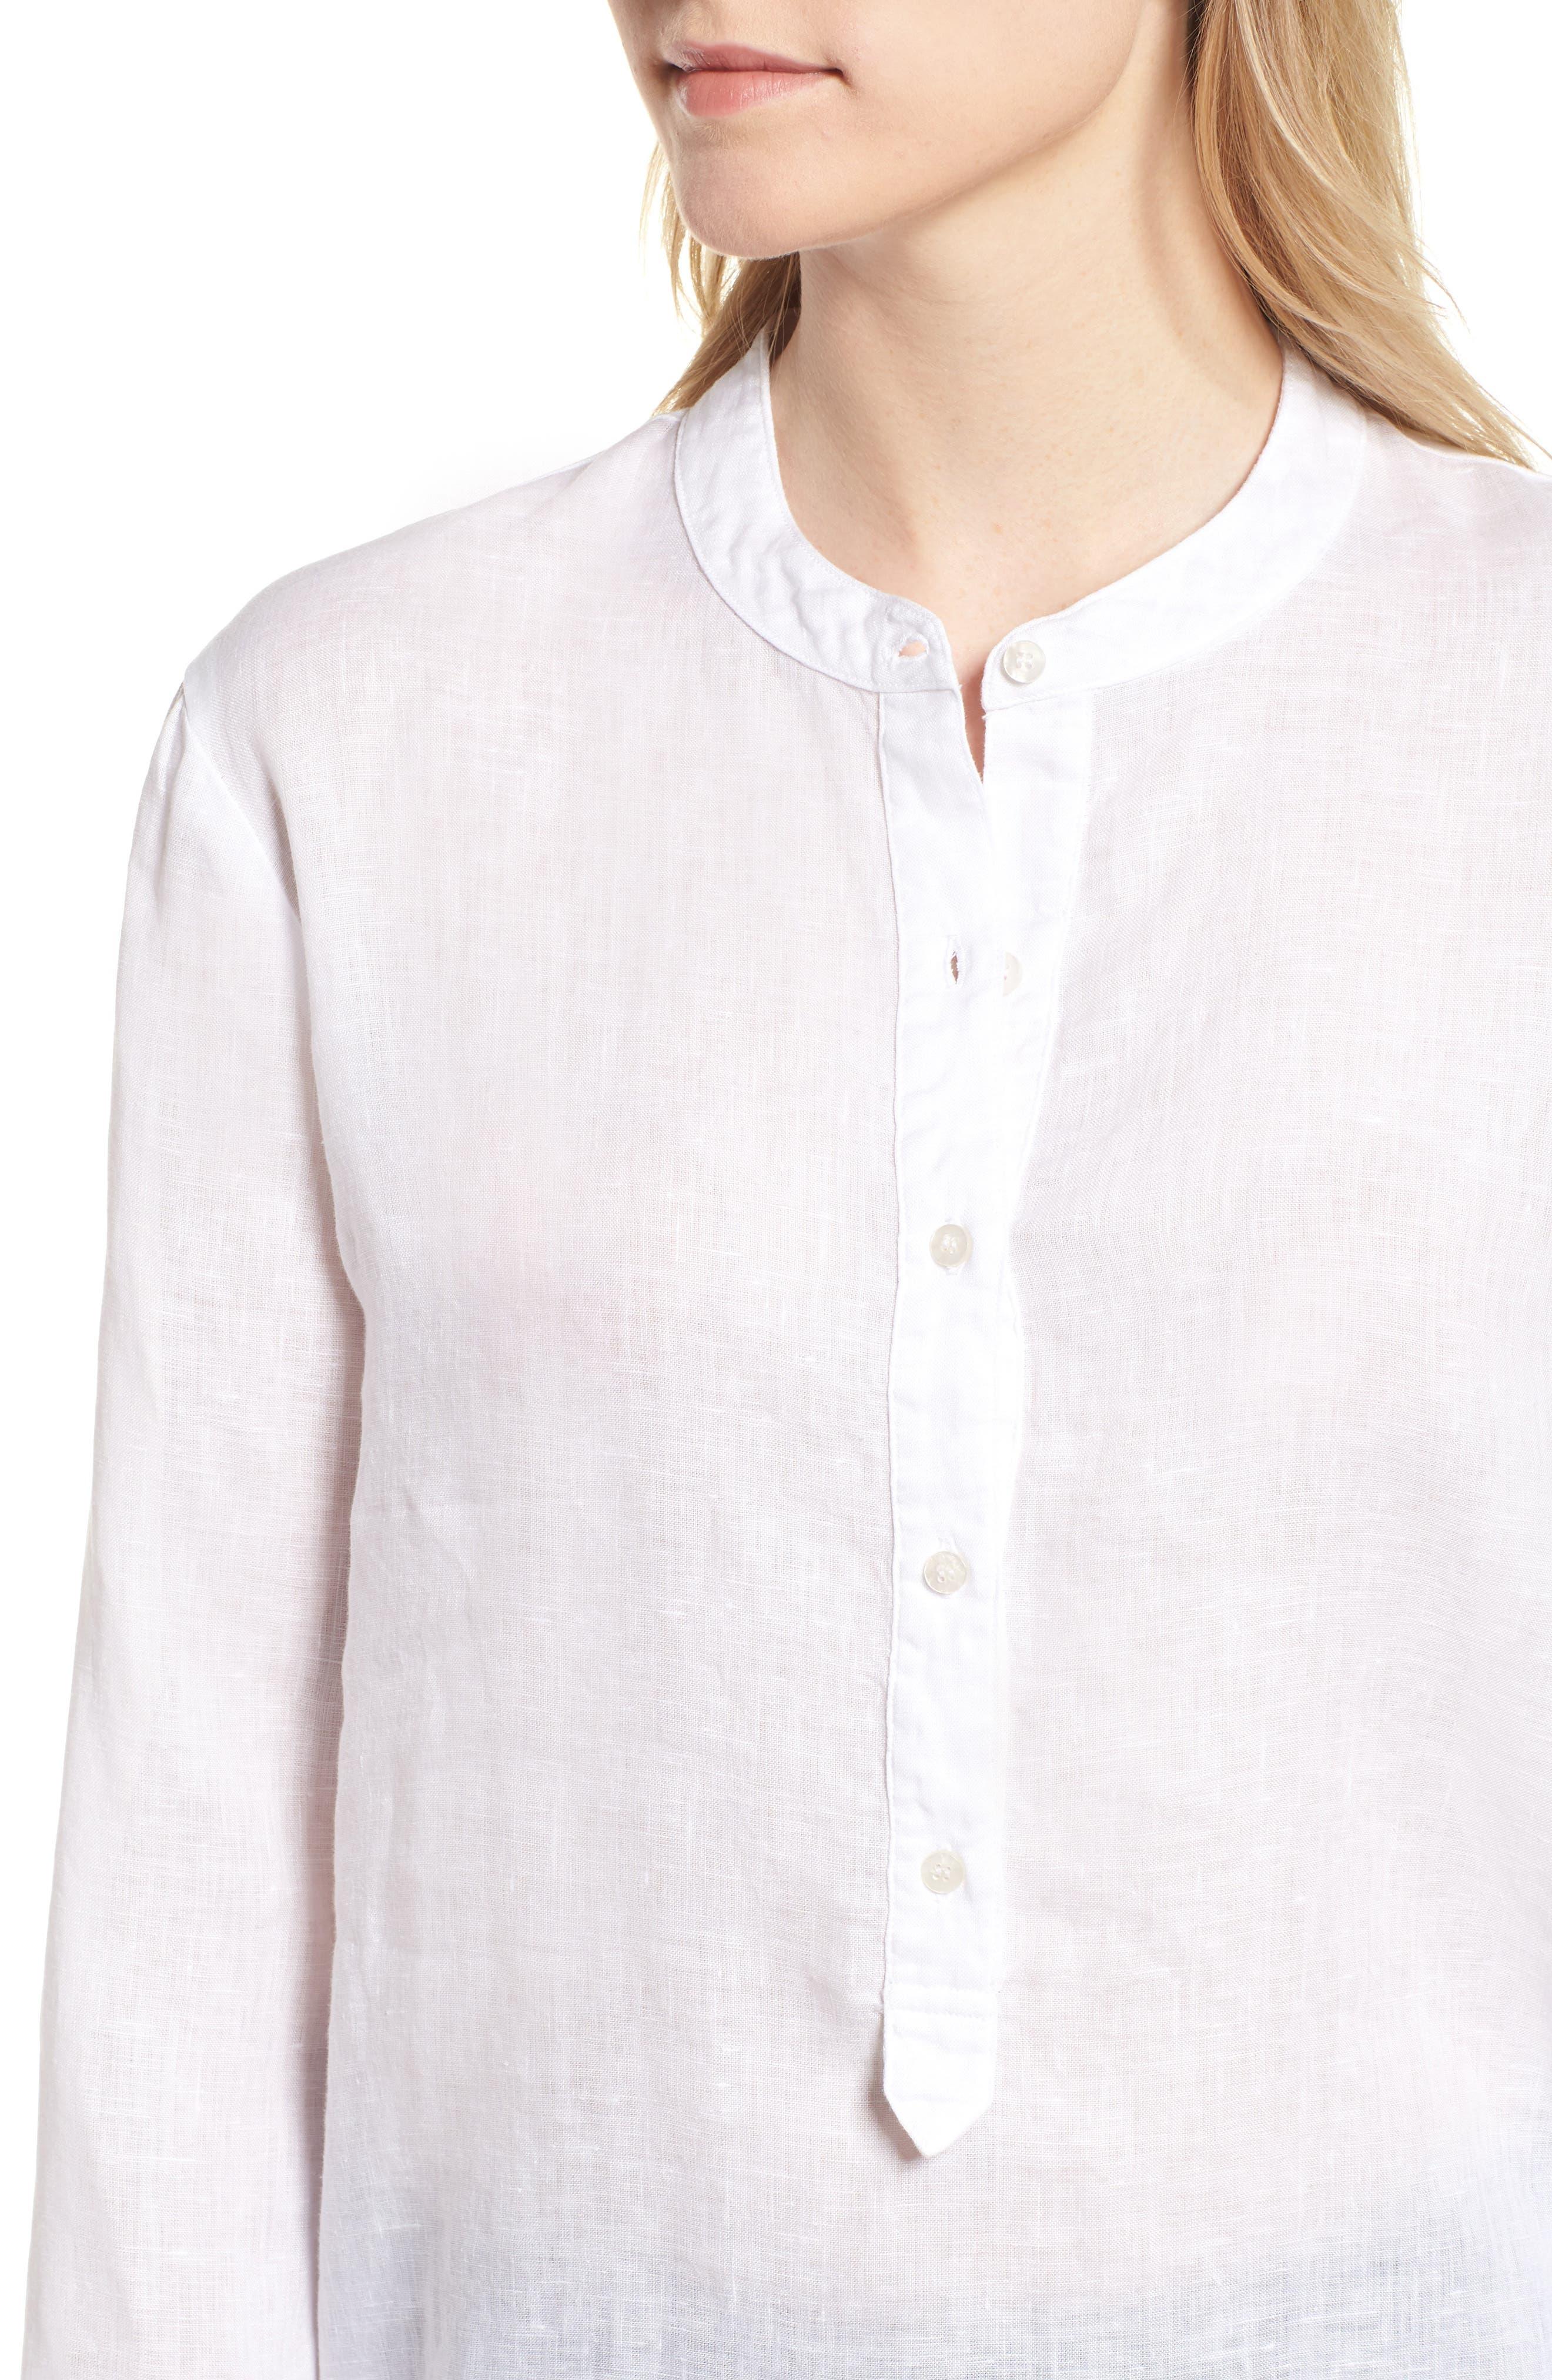 Shirting Tunic Top,                             Alternate thumbnail 4, color,                             White